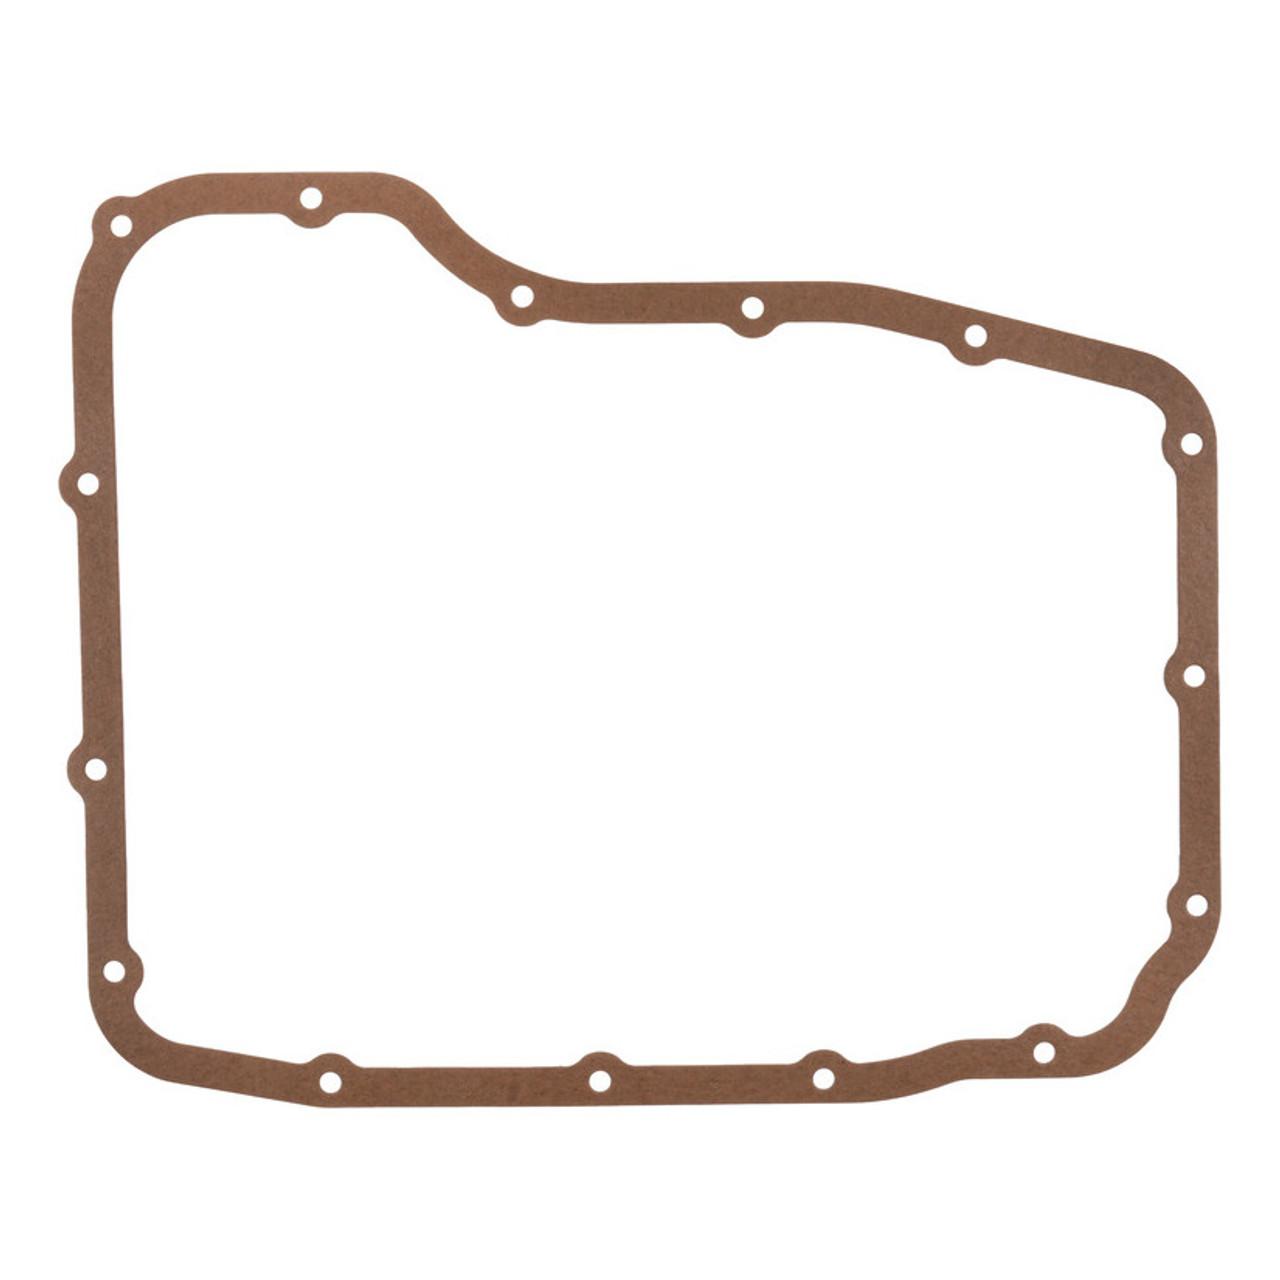 44500F Fiber TransTec (Brown) Pan Gasket